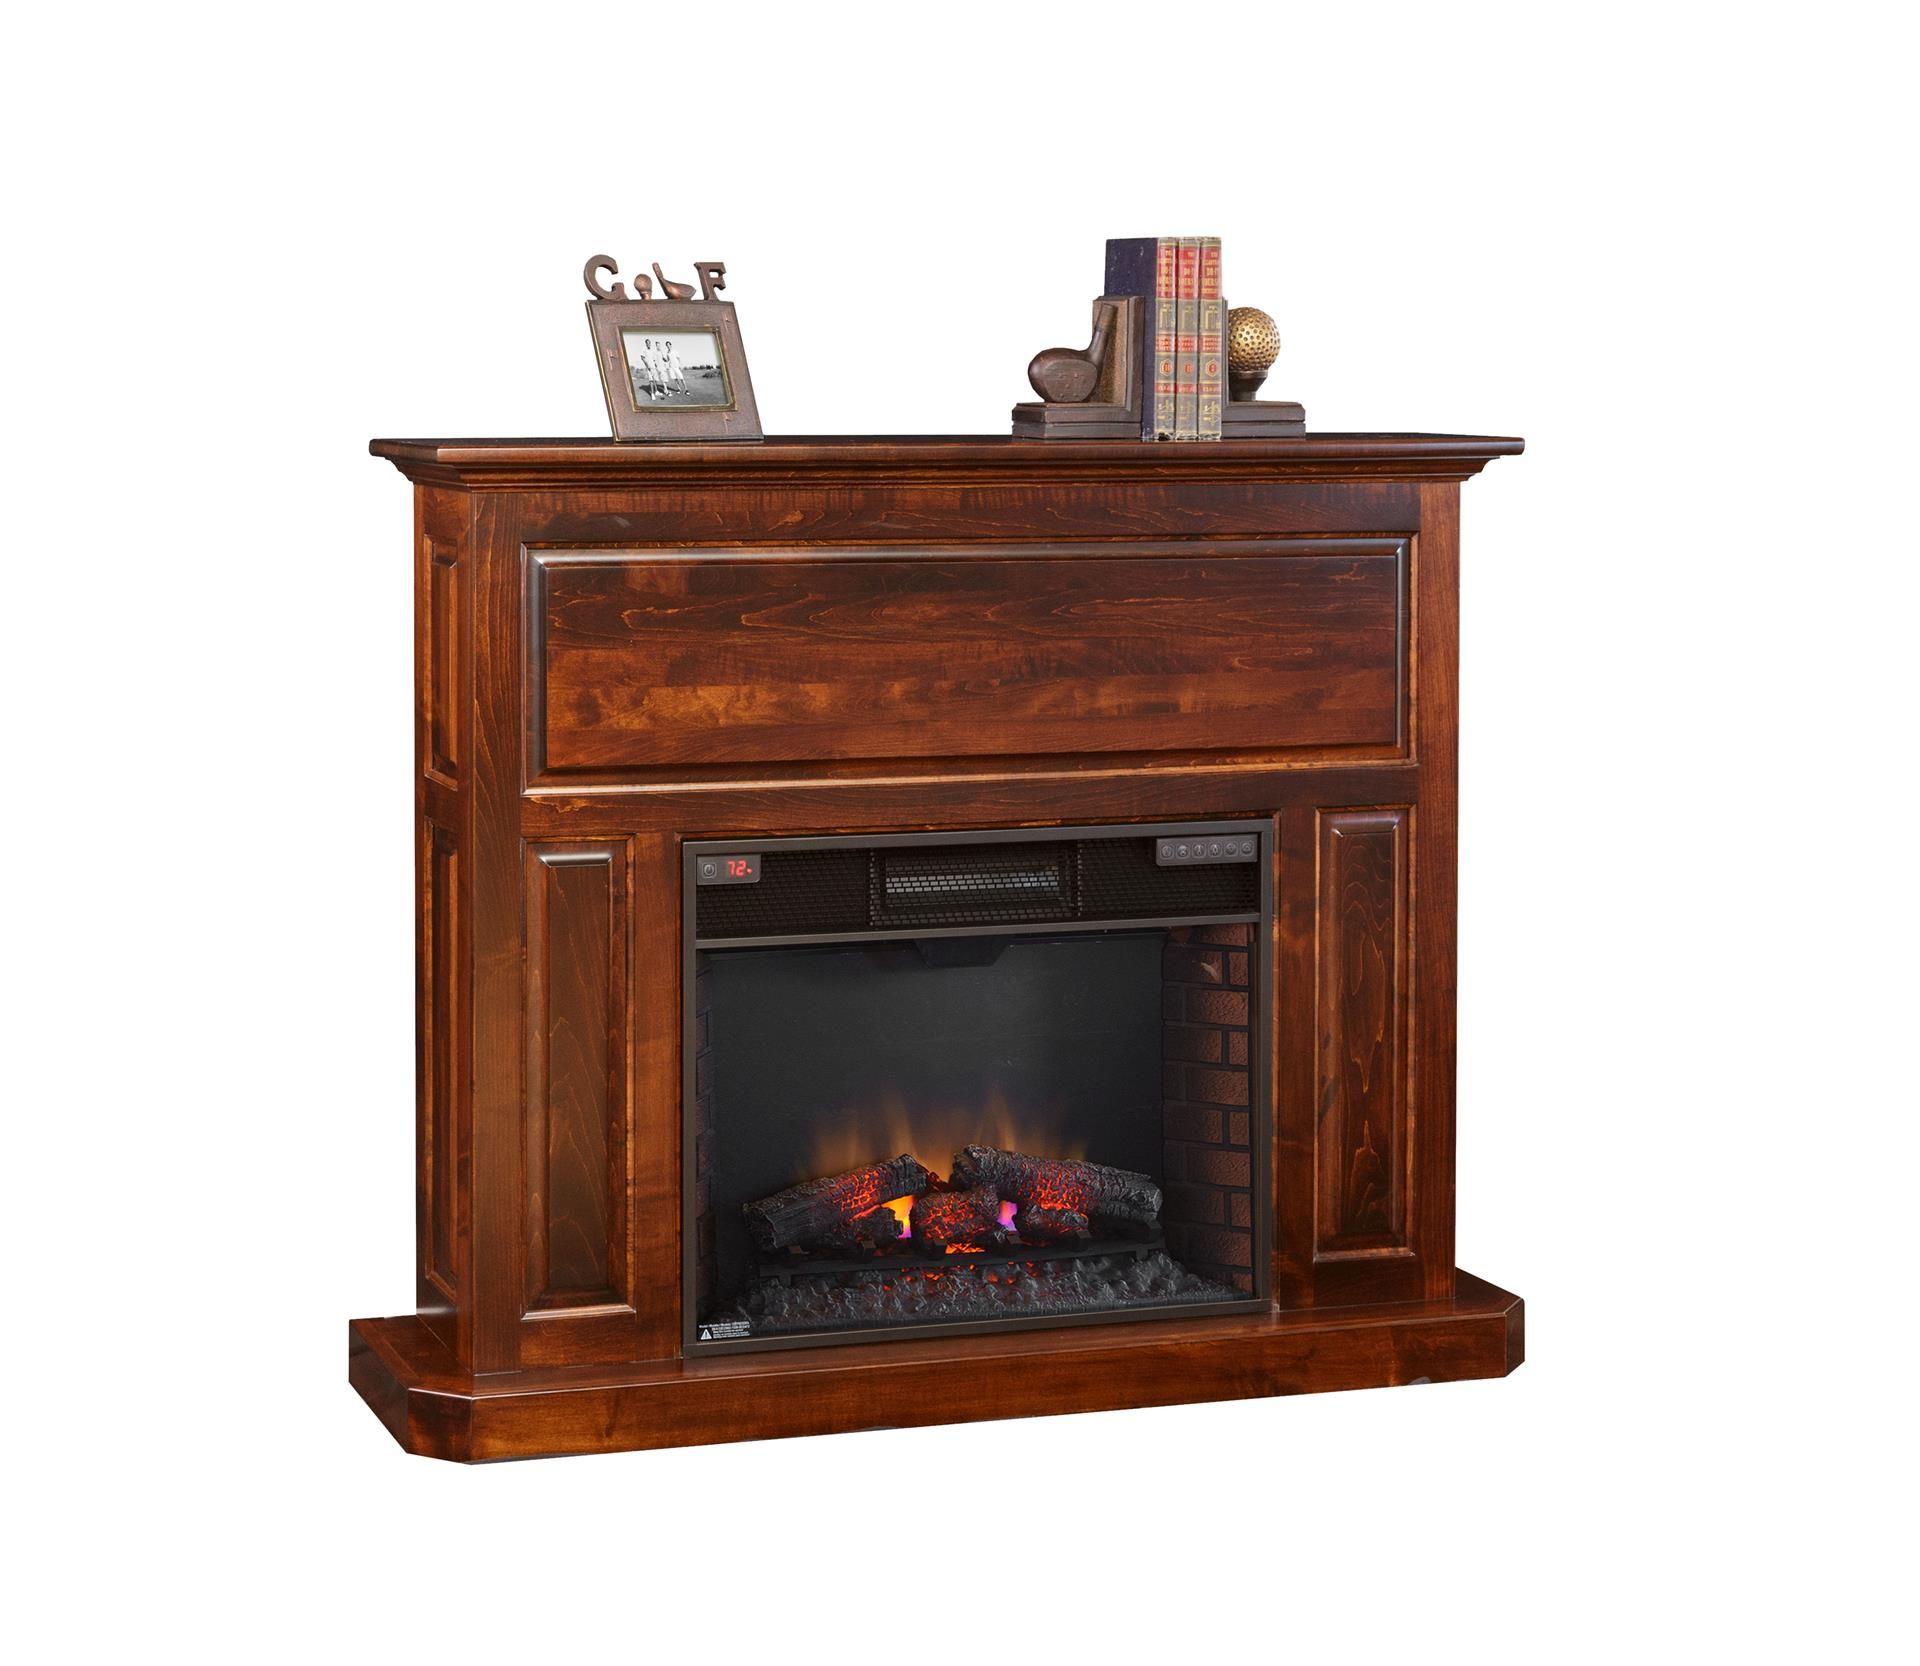 electric amish fireplace amish fireplaces pinterest amish